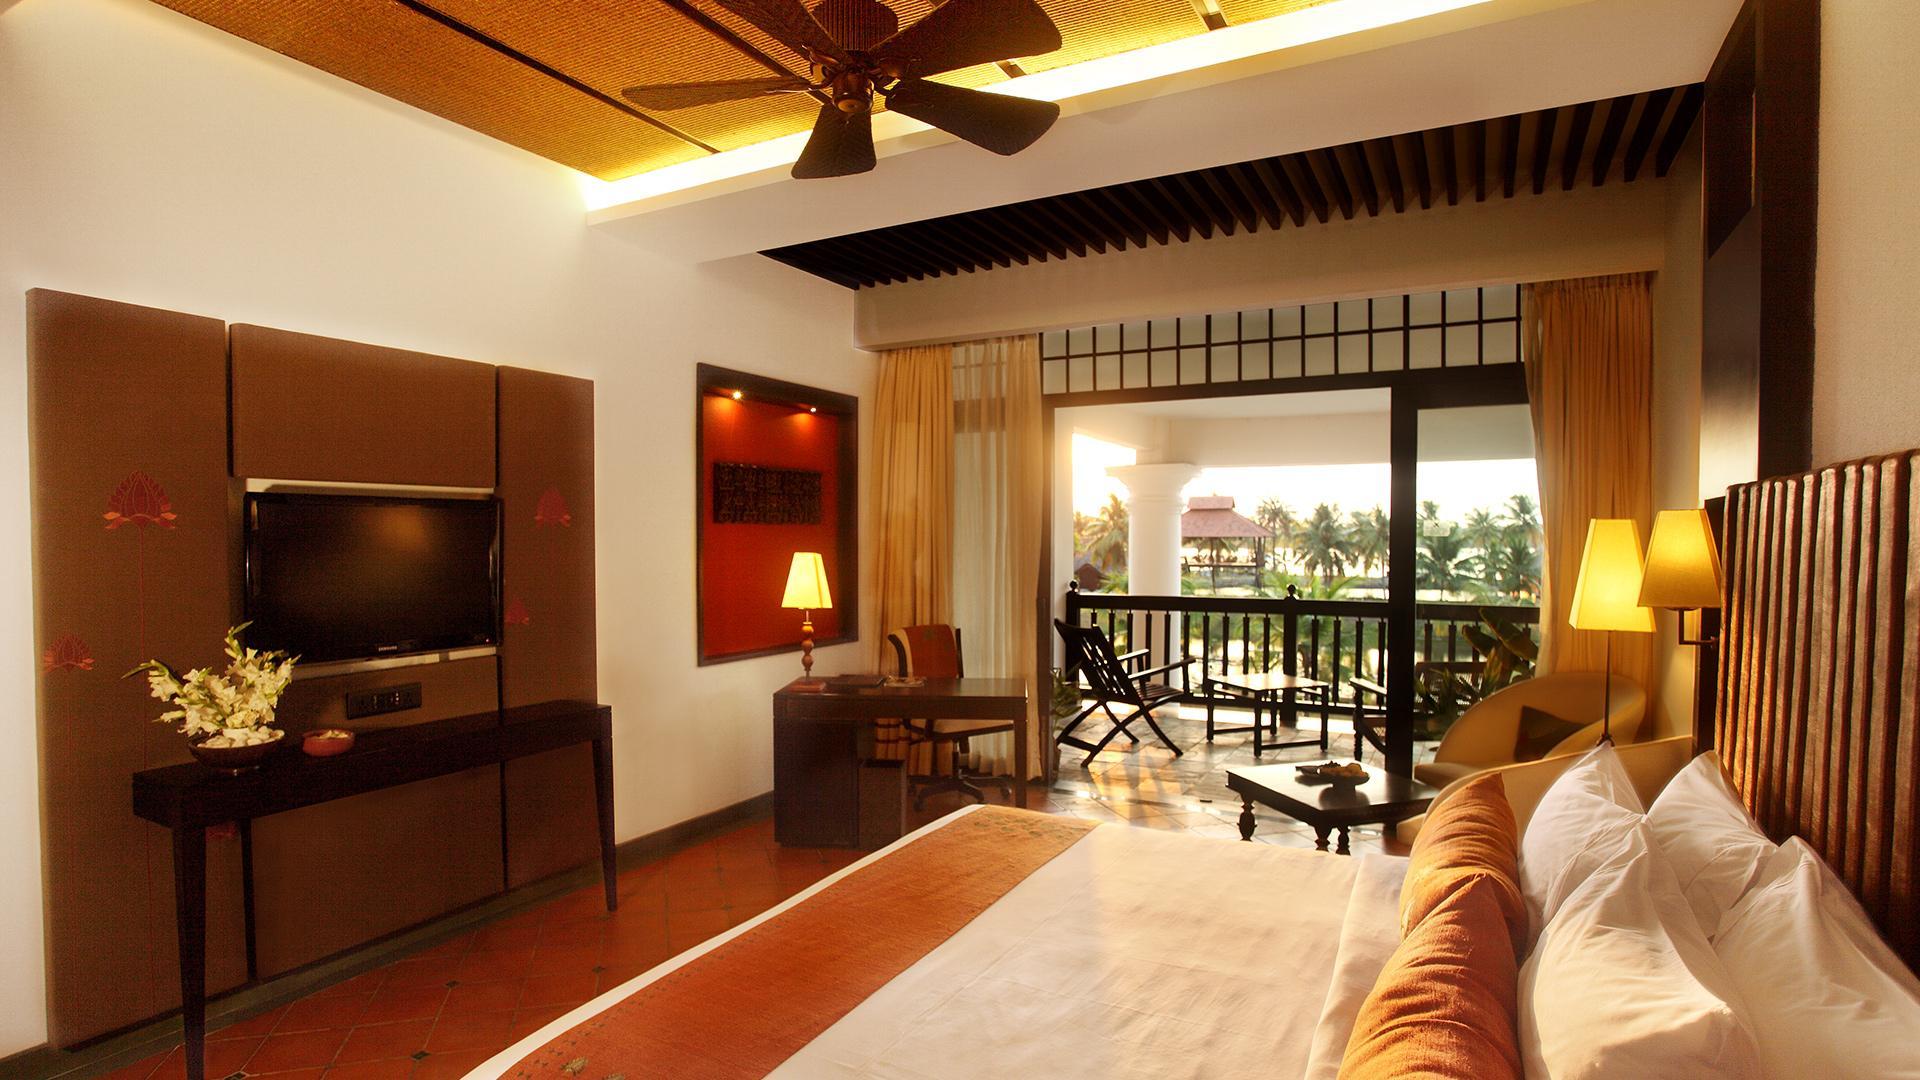 Superior Room with Balcony image 1 at Vasundhara Sarovar Premiere by Alappuzha, Kerala, India